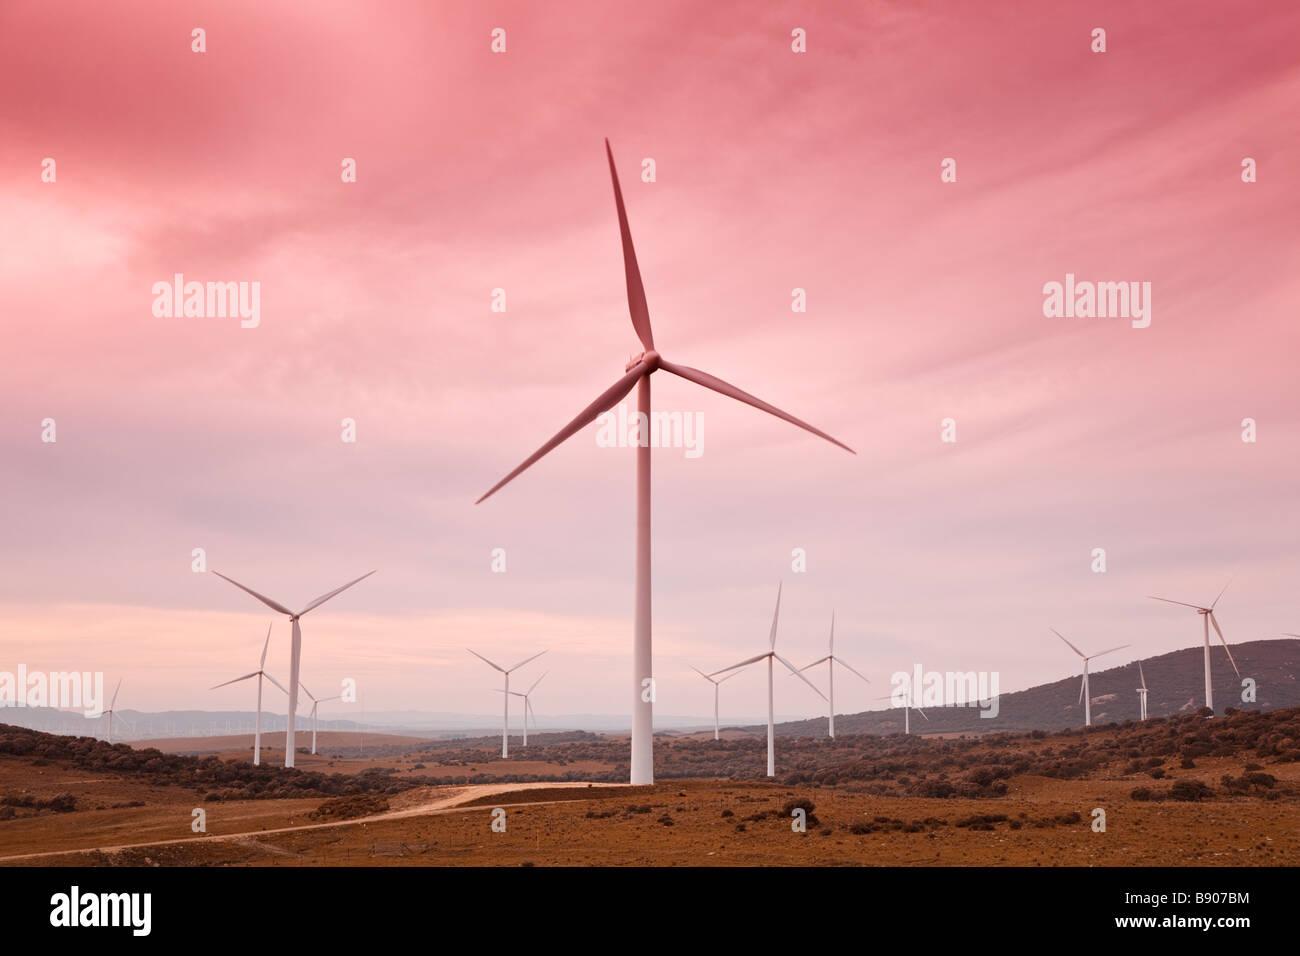 Wind farm near Facinas Cadiz Province Spain - Stock Image